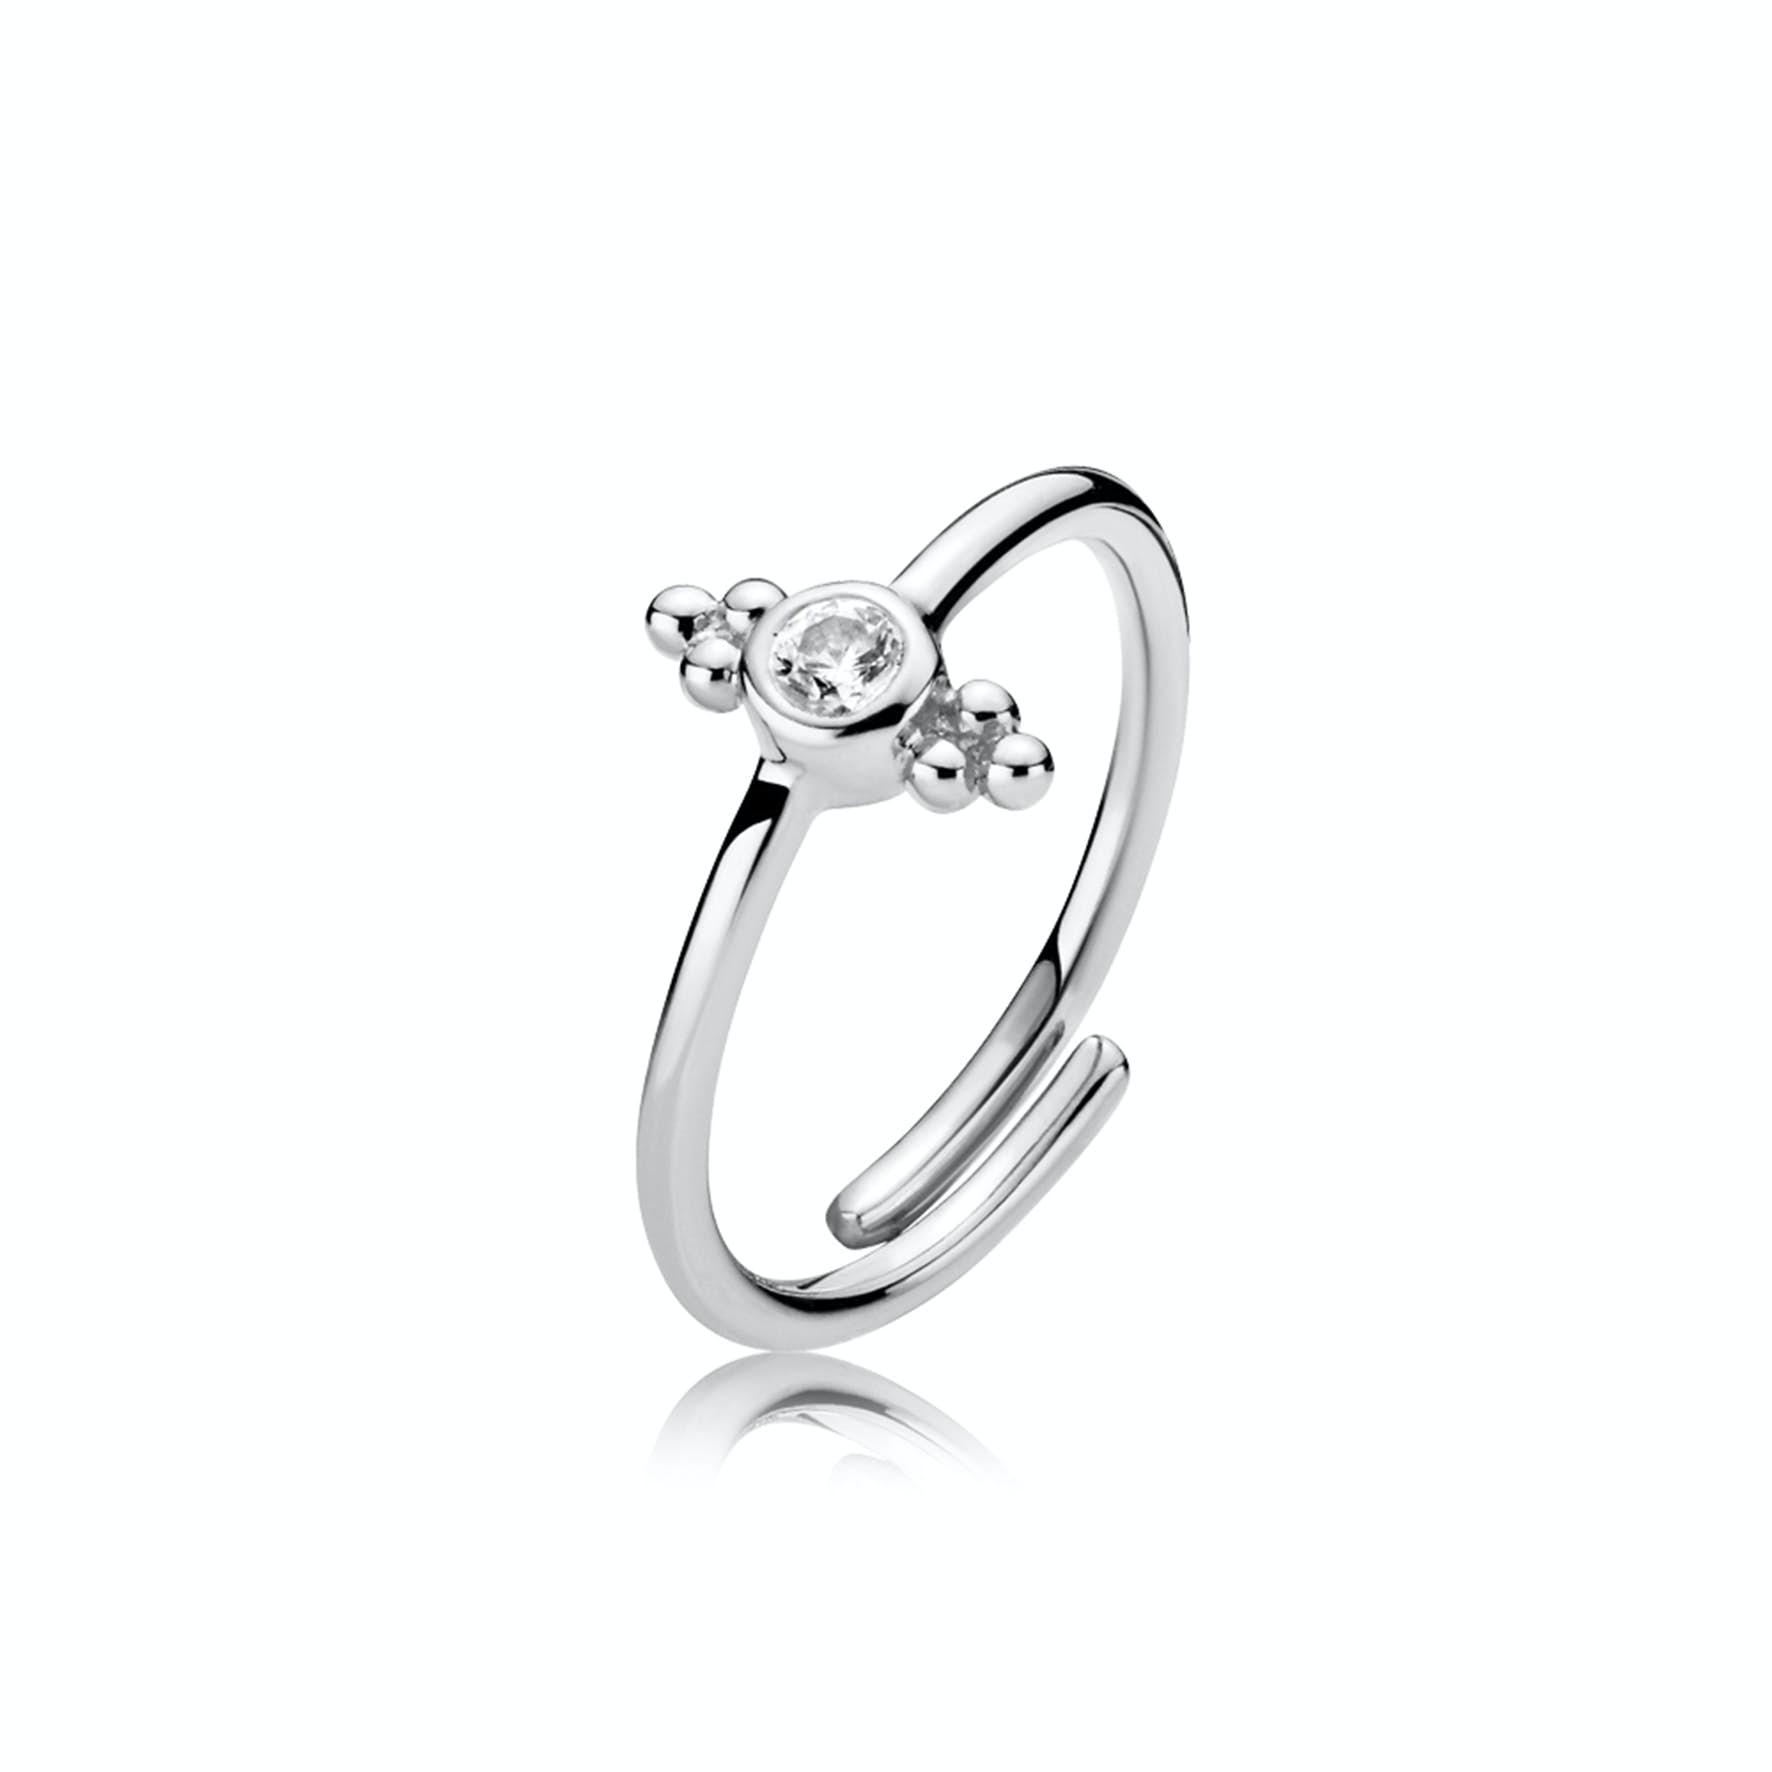 Sofie By Sistie Ring von Sistie in Silber Sterling 925 Blank